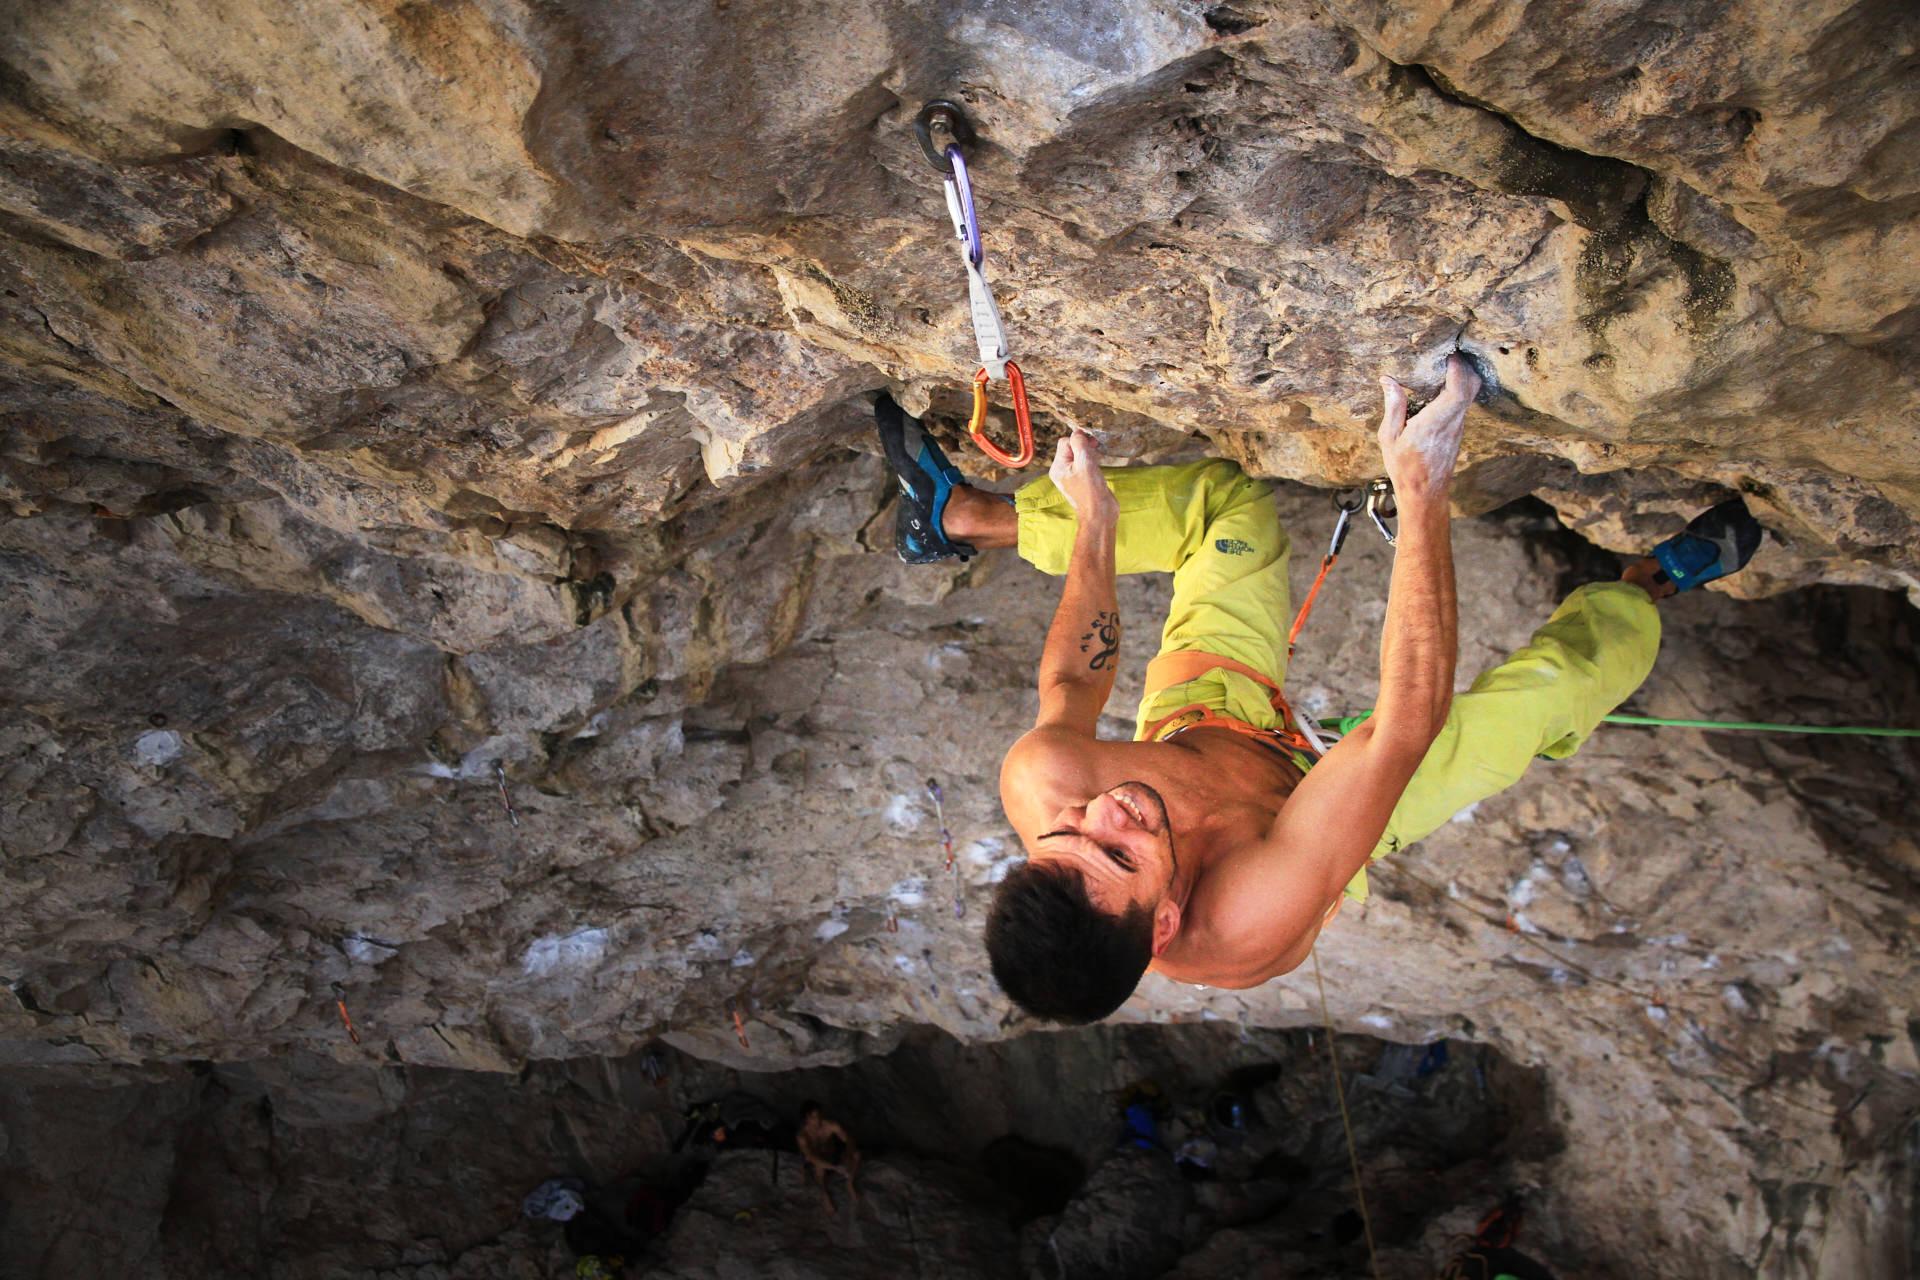 Lisbon Climbing Guide - André Neres climbing Mar de Bering 8c+ in Meio Mango ©Martim Vidigal